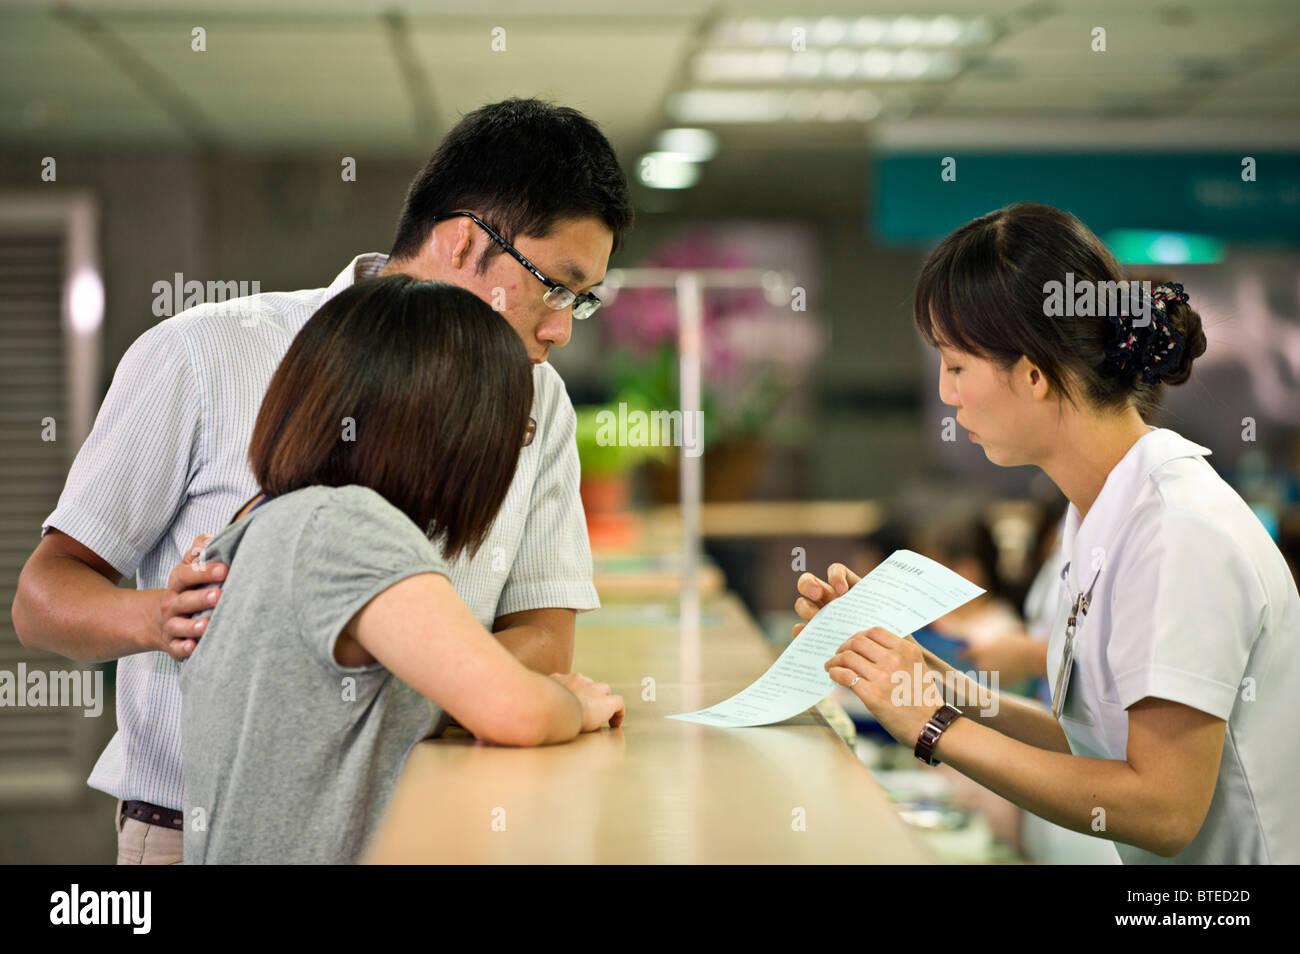 Nurse Explaining To Patient At Nursing Desk In Hospital, Taiwan